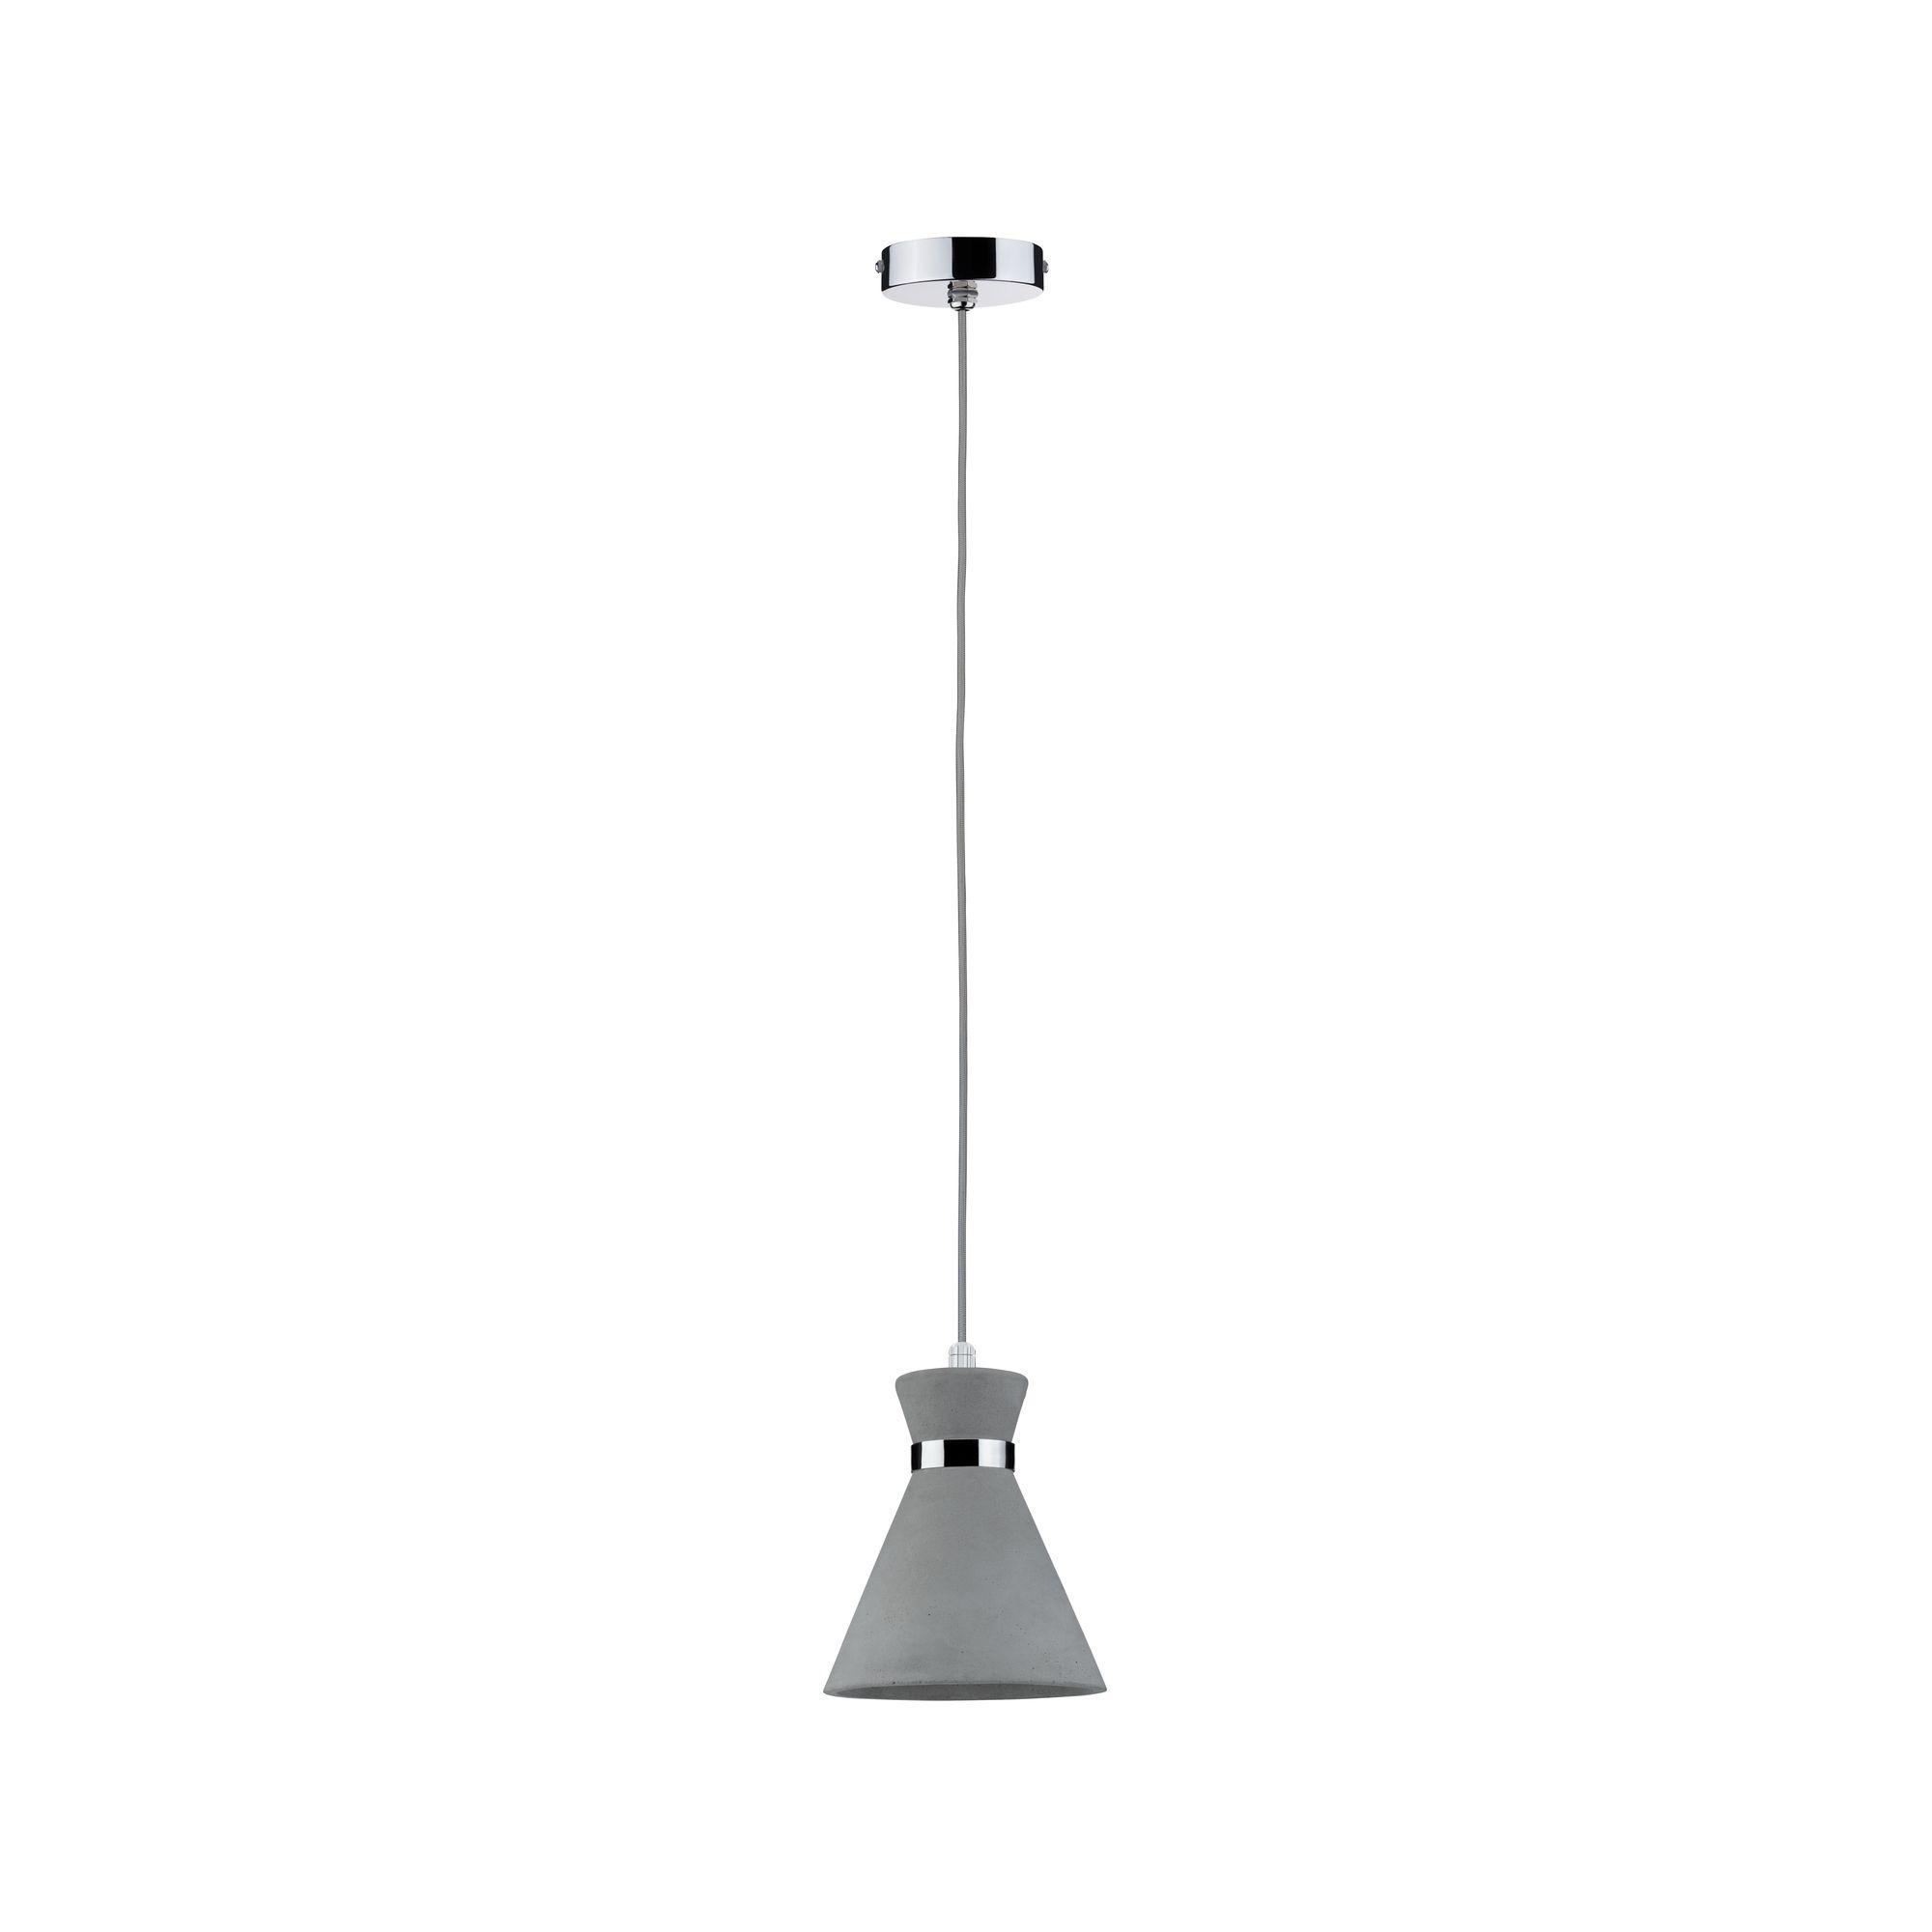 Verve lampa wisząca IP44 E27 708.90 Paulmann